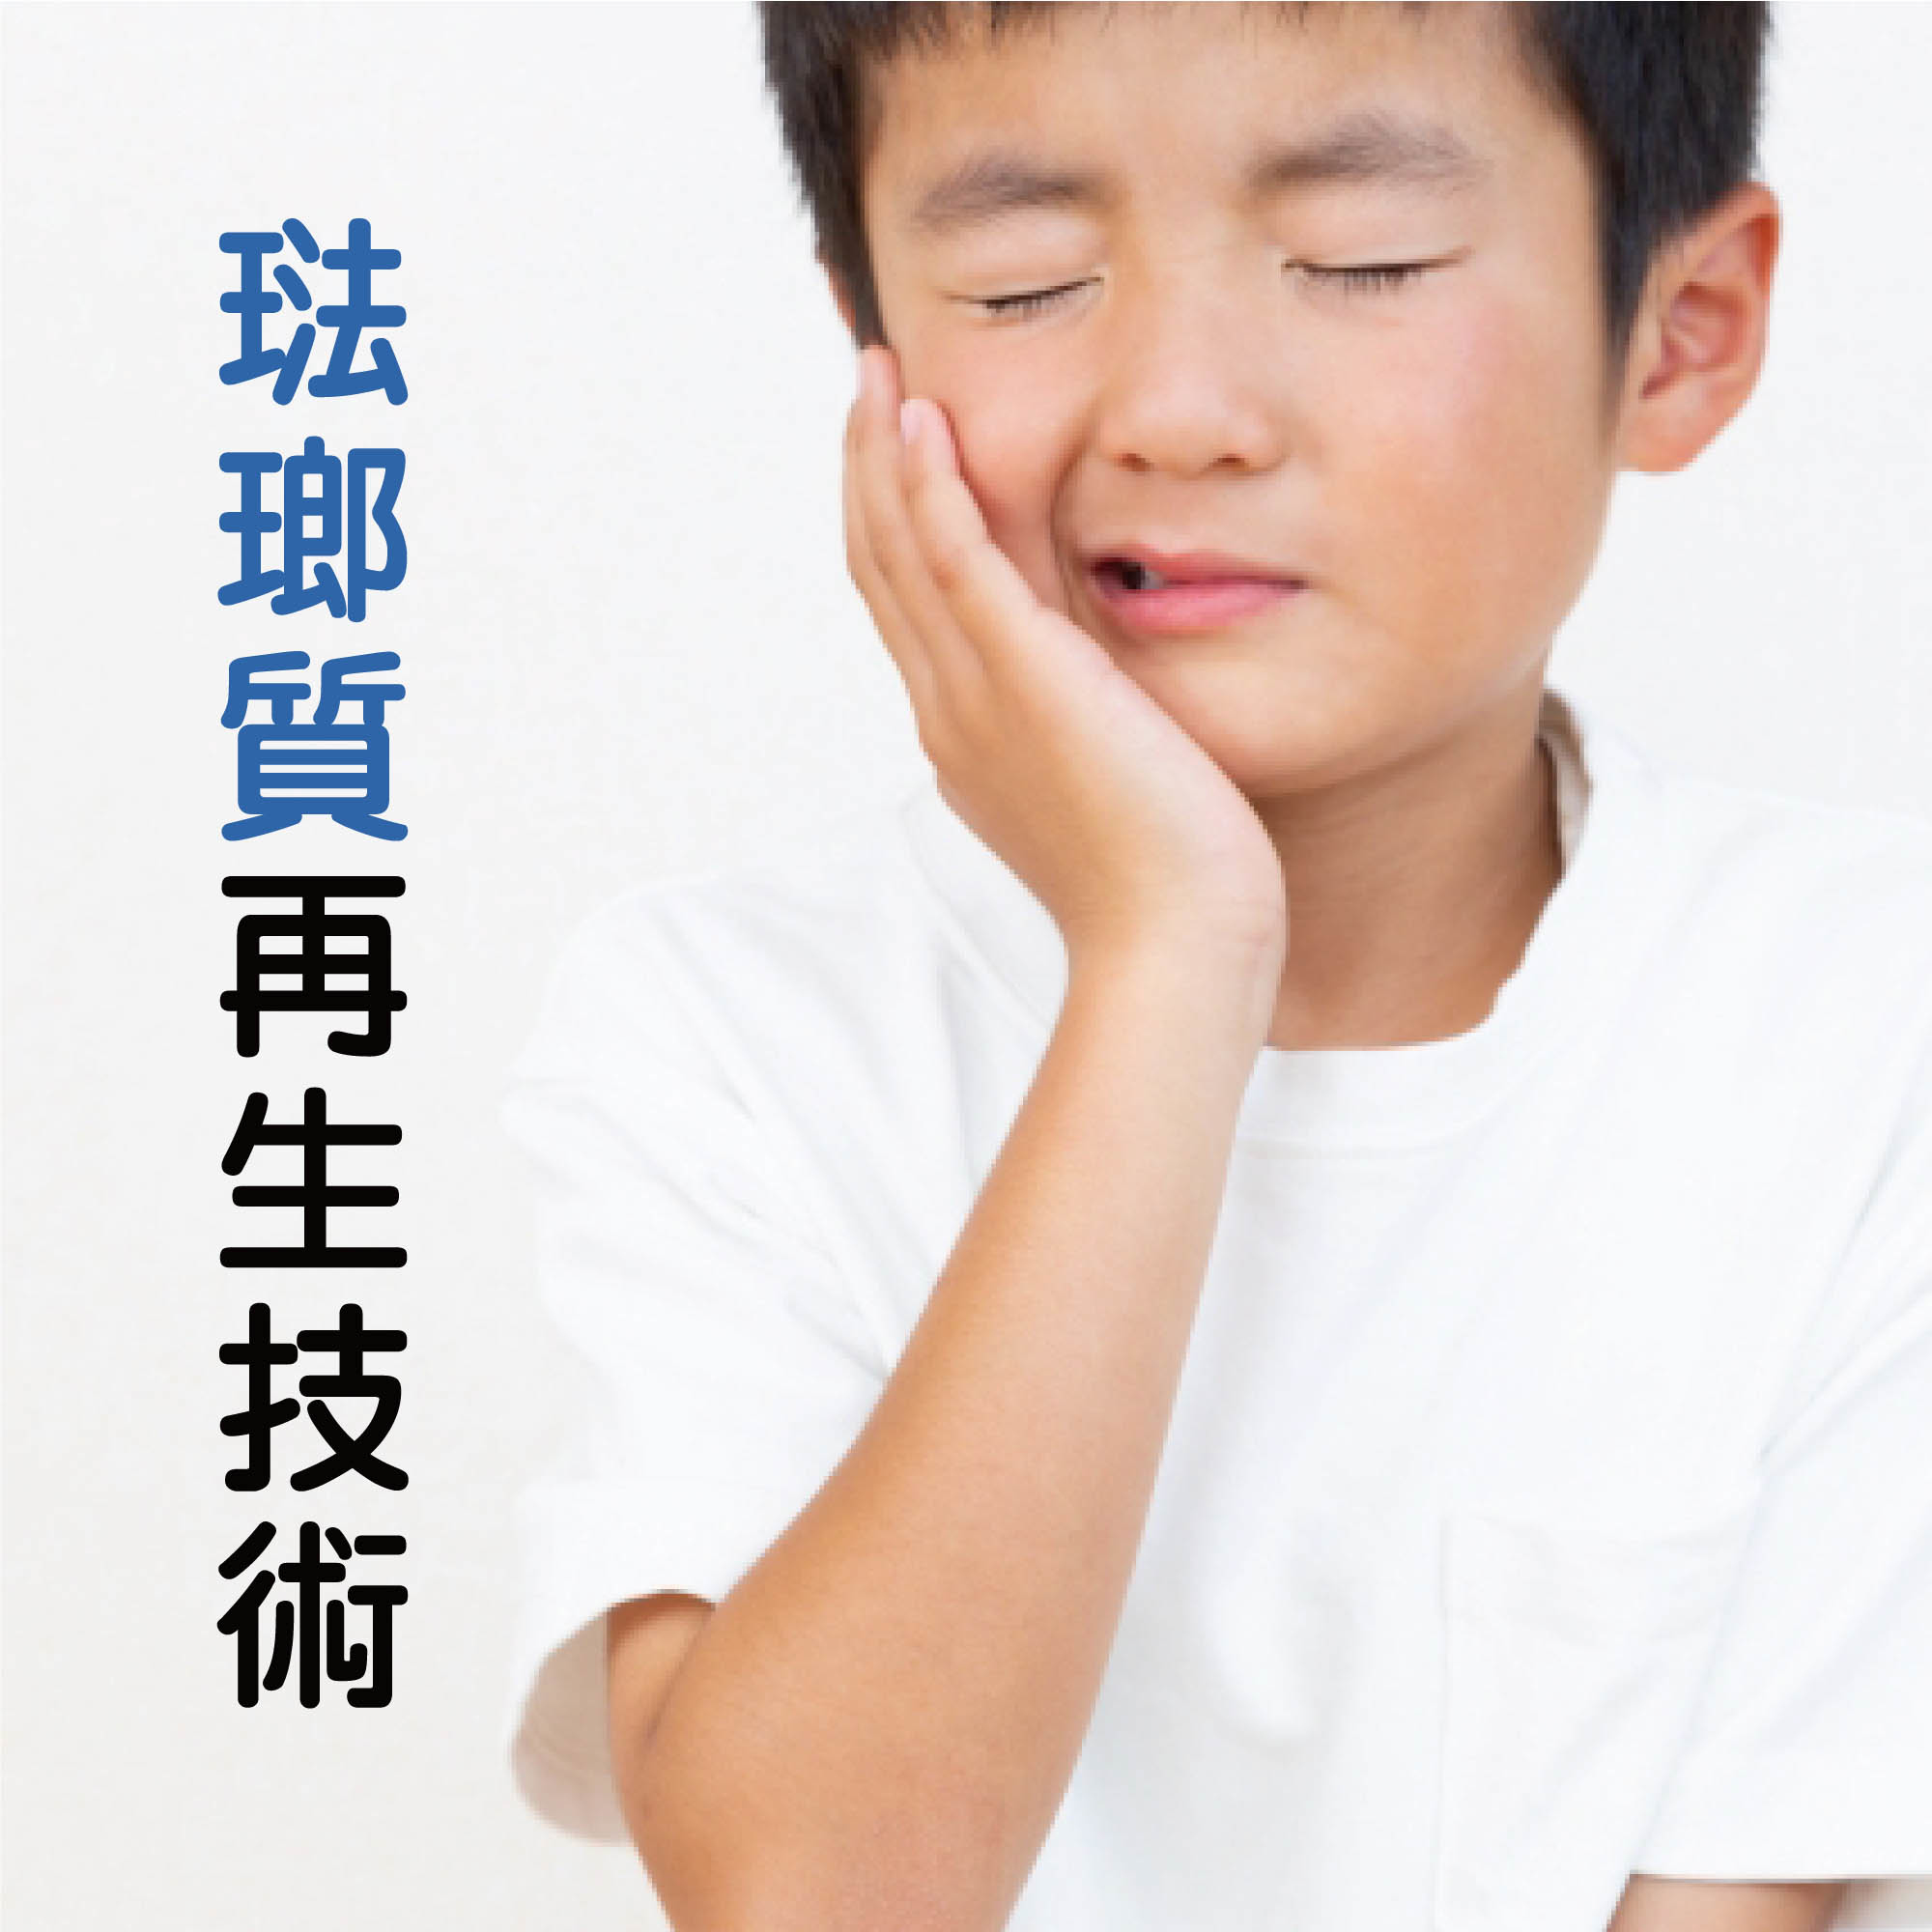 MISOKA奈米礦物牙刷 琺瑯質再生技術